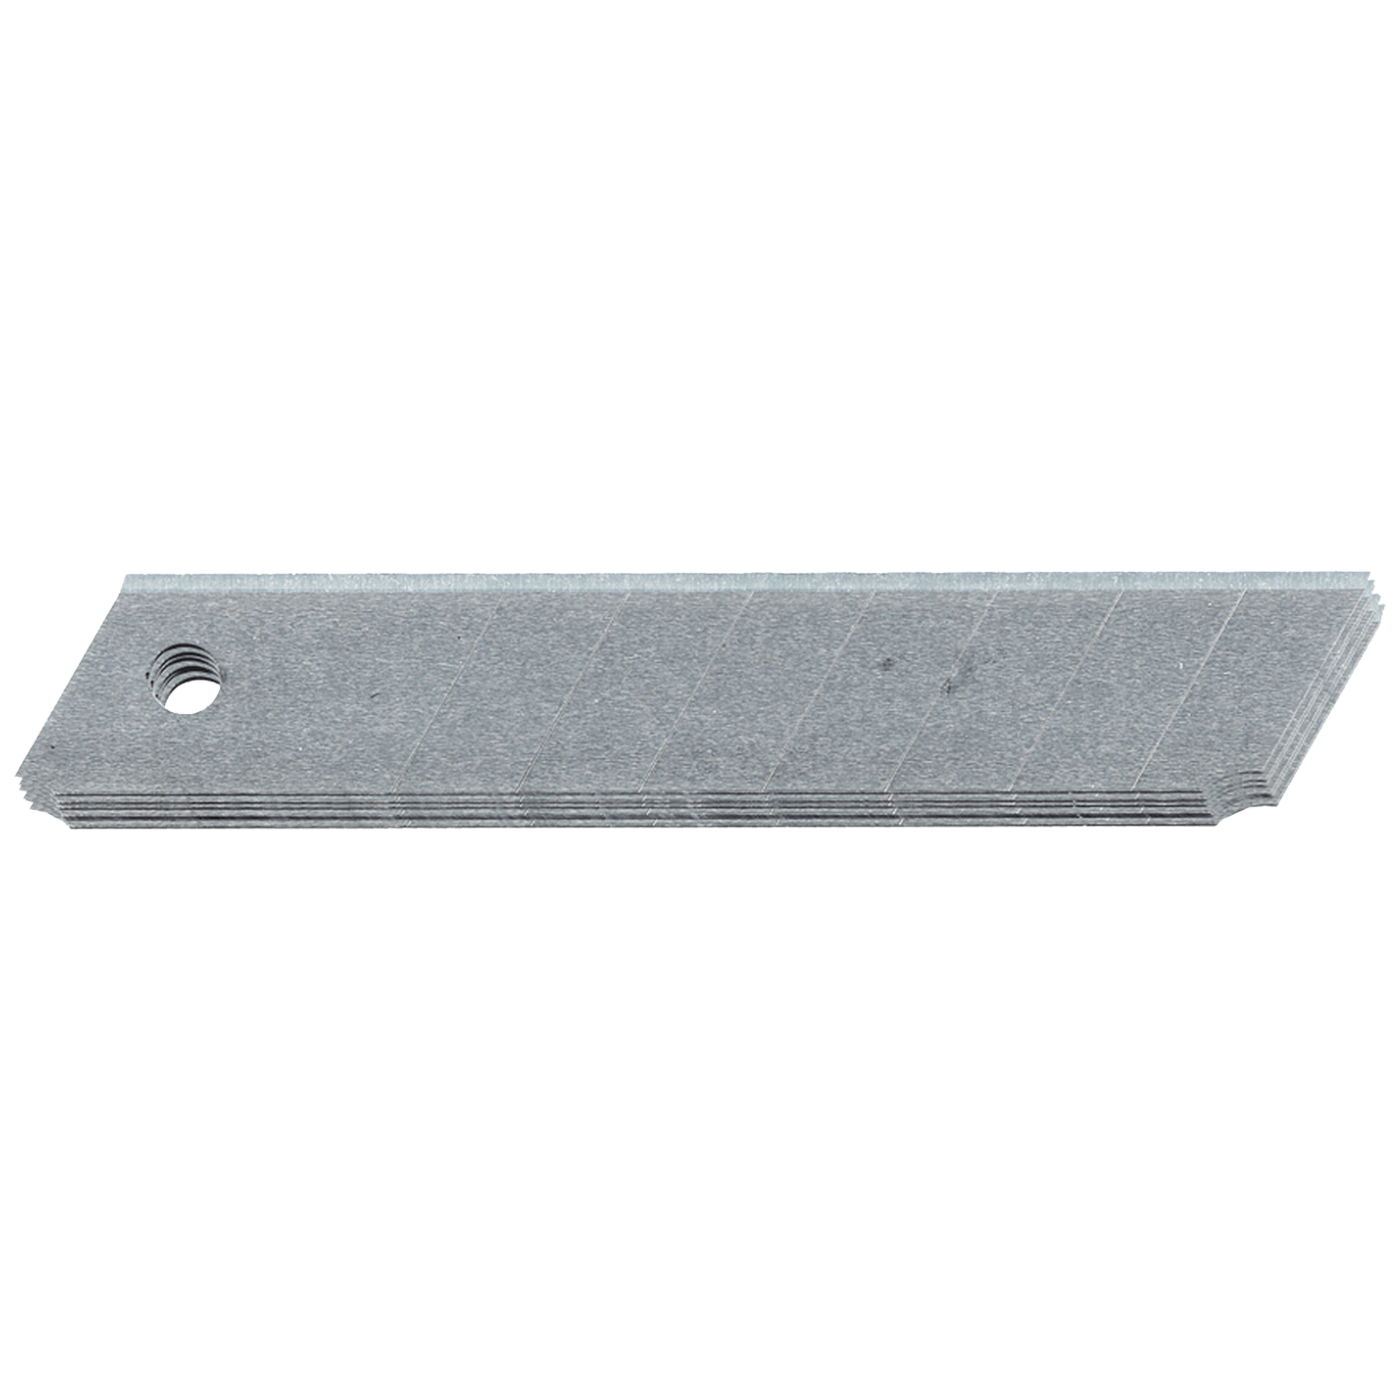 Oštrice za skalpel SZKR 18, 18 mm, pakiranje 10 kom.